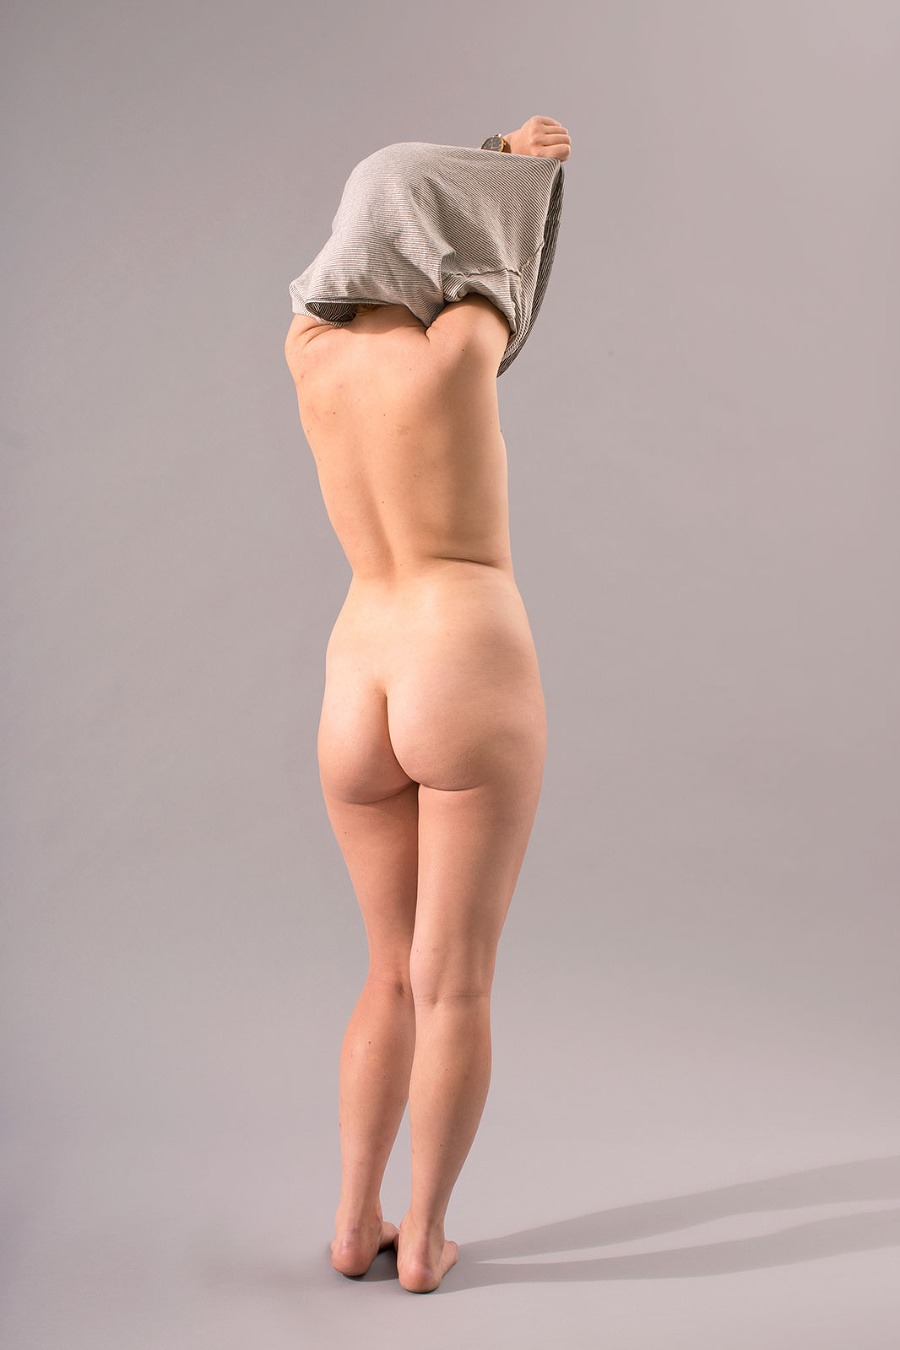 Flat ass nude